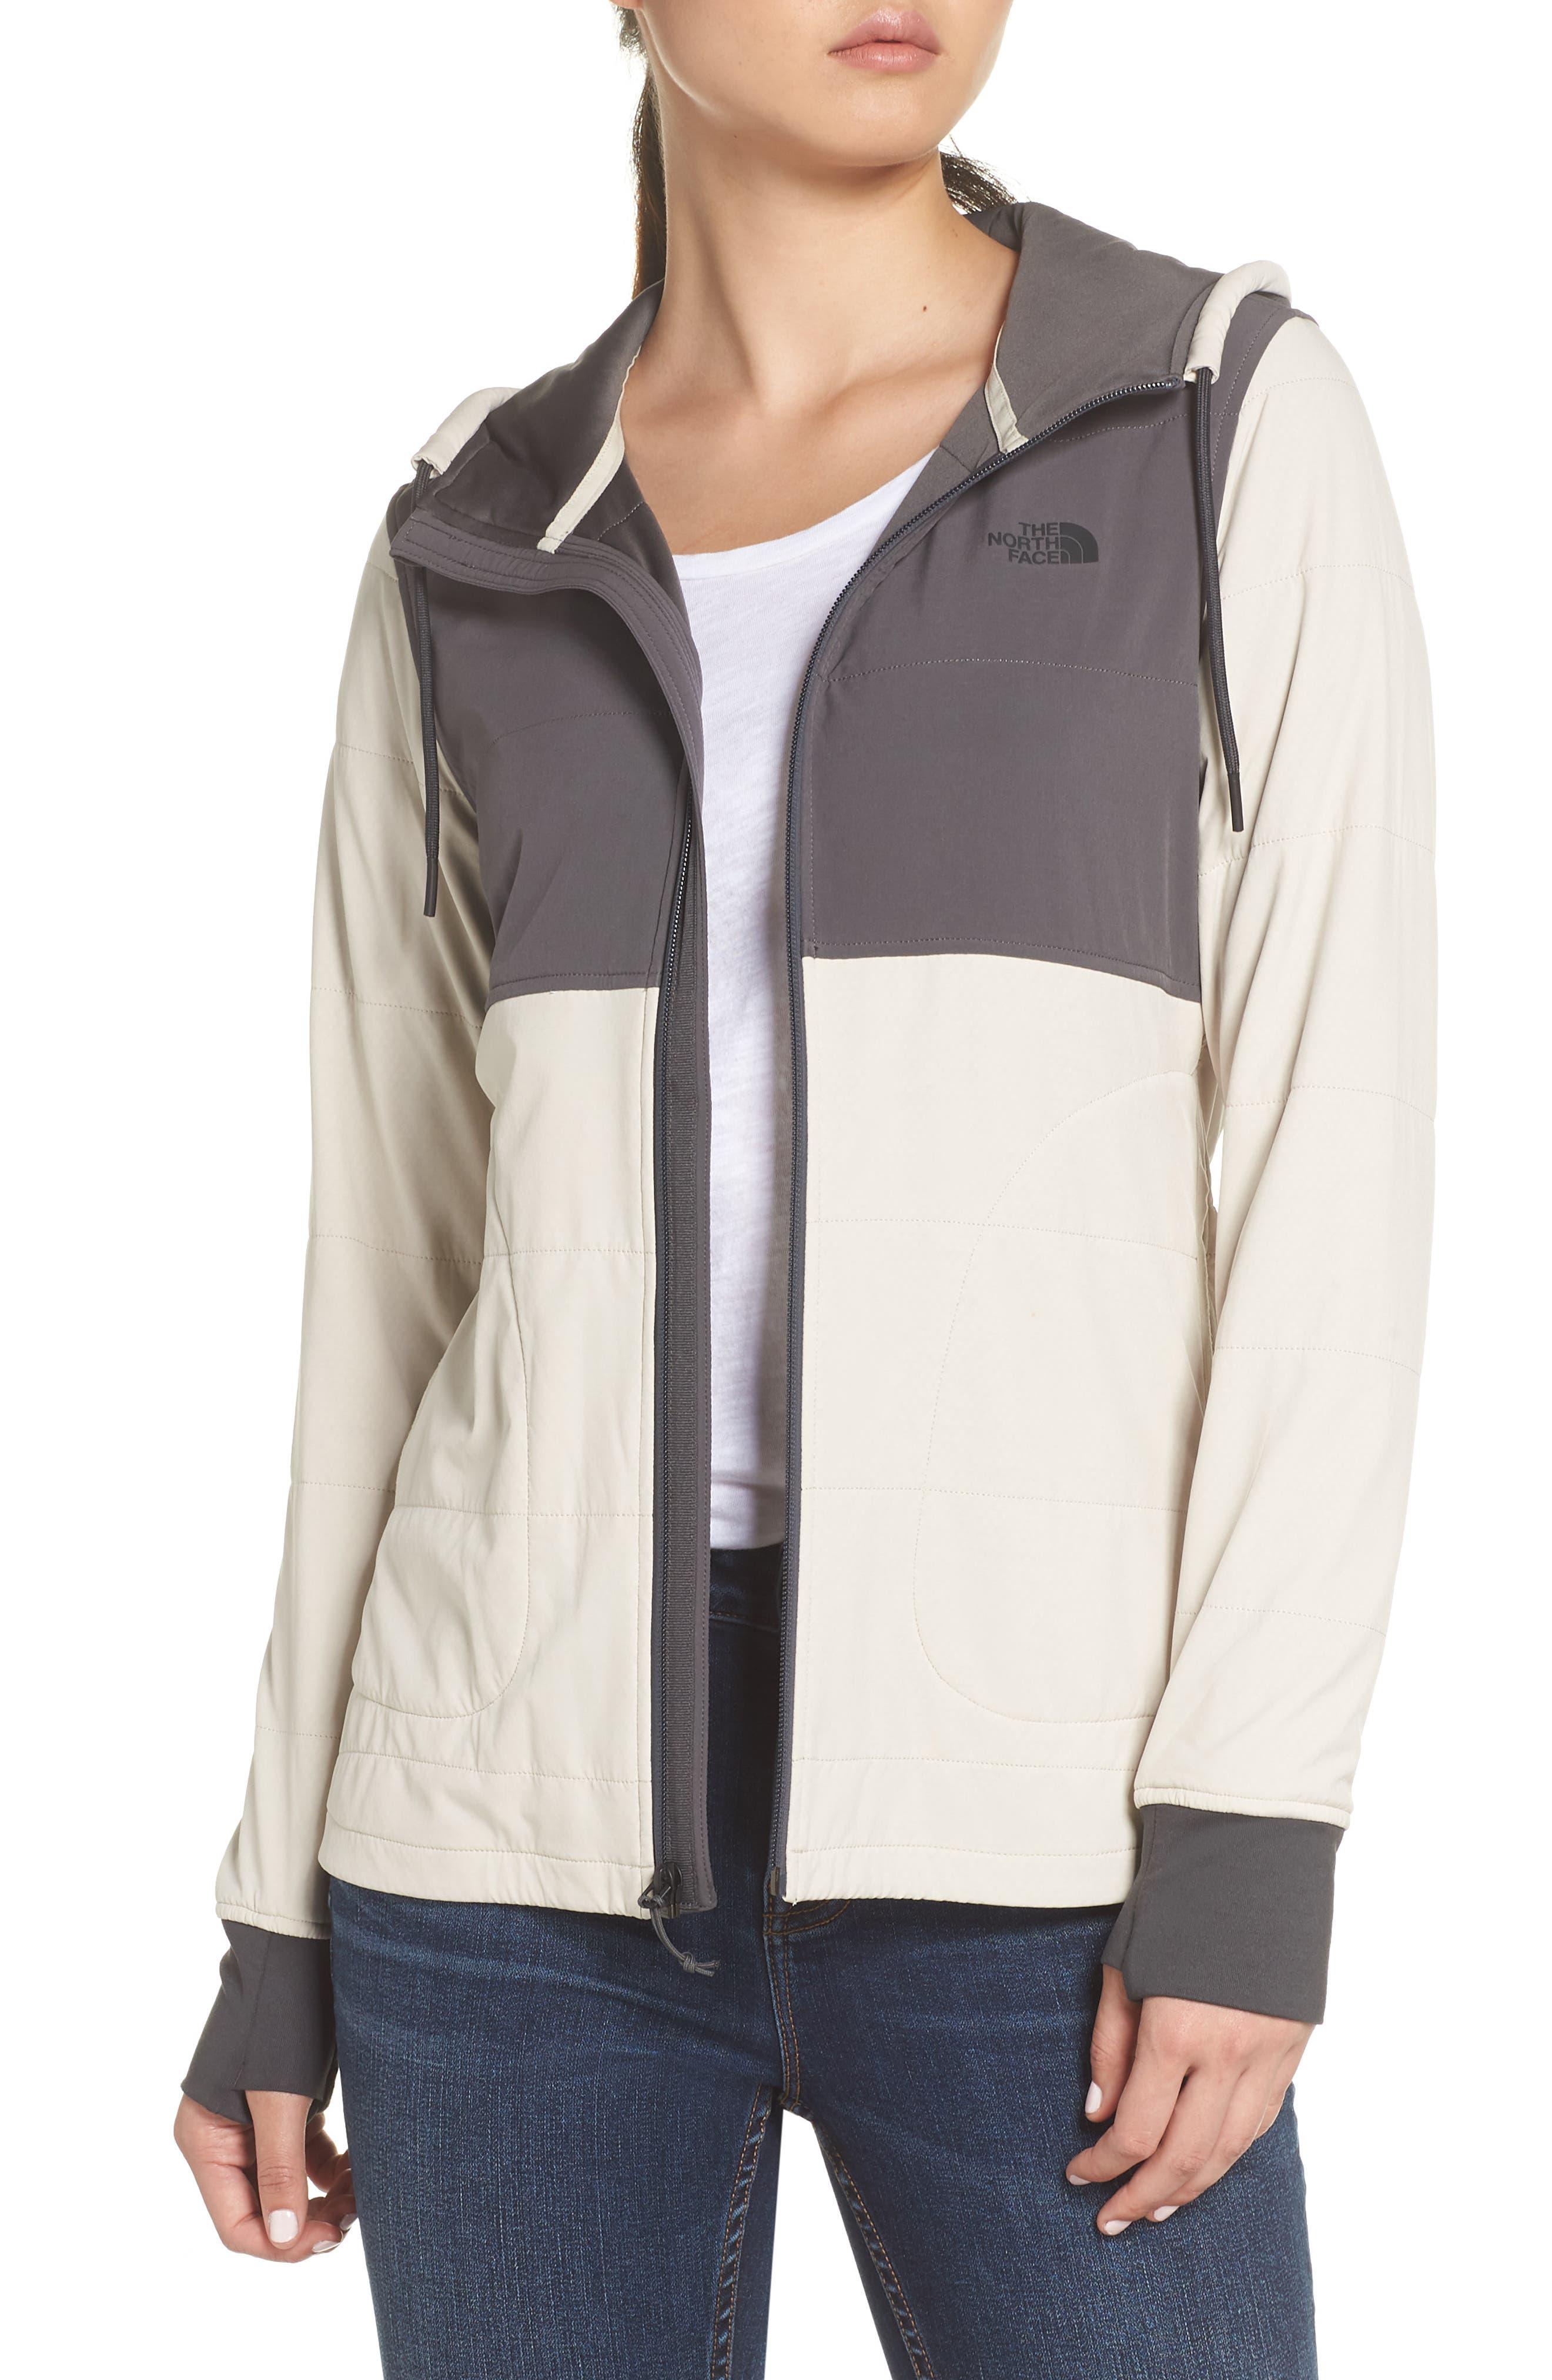 Mountain Zip Hooded Sweatshirt,                         Main,                         color, PEYOTE BEIGE/ GRAPHITE GREY